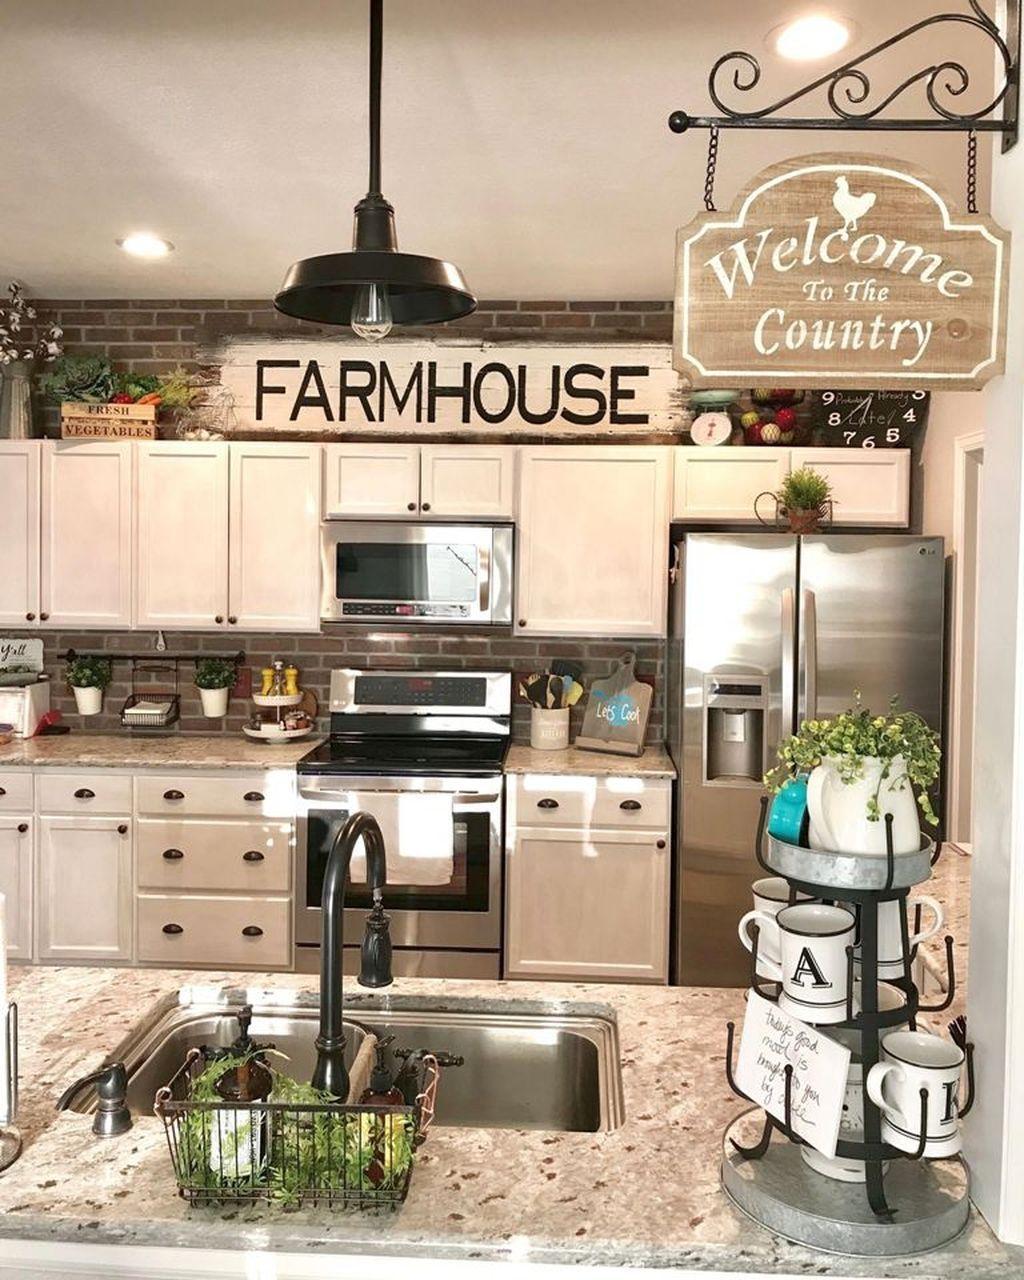 Pin By Loretta Gallegos On Decorating Kitchen Cabinets Decor Above Kitchen Cabinets Farmhouse Kitchen Decor